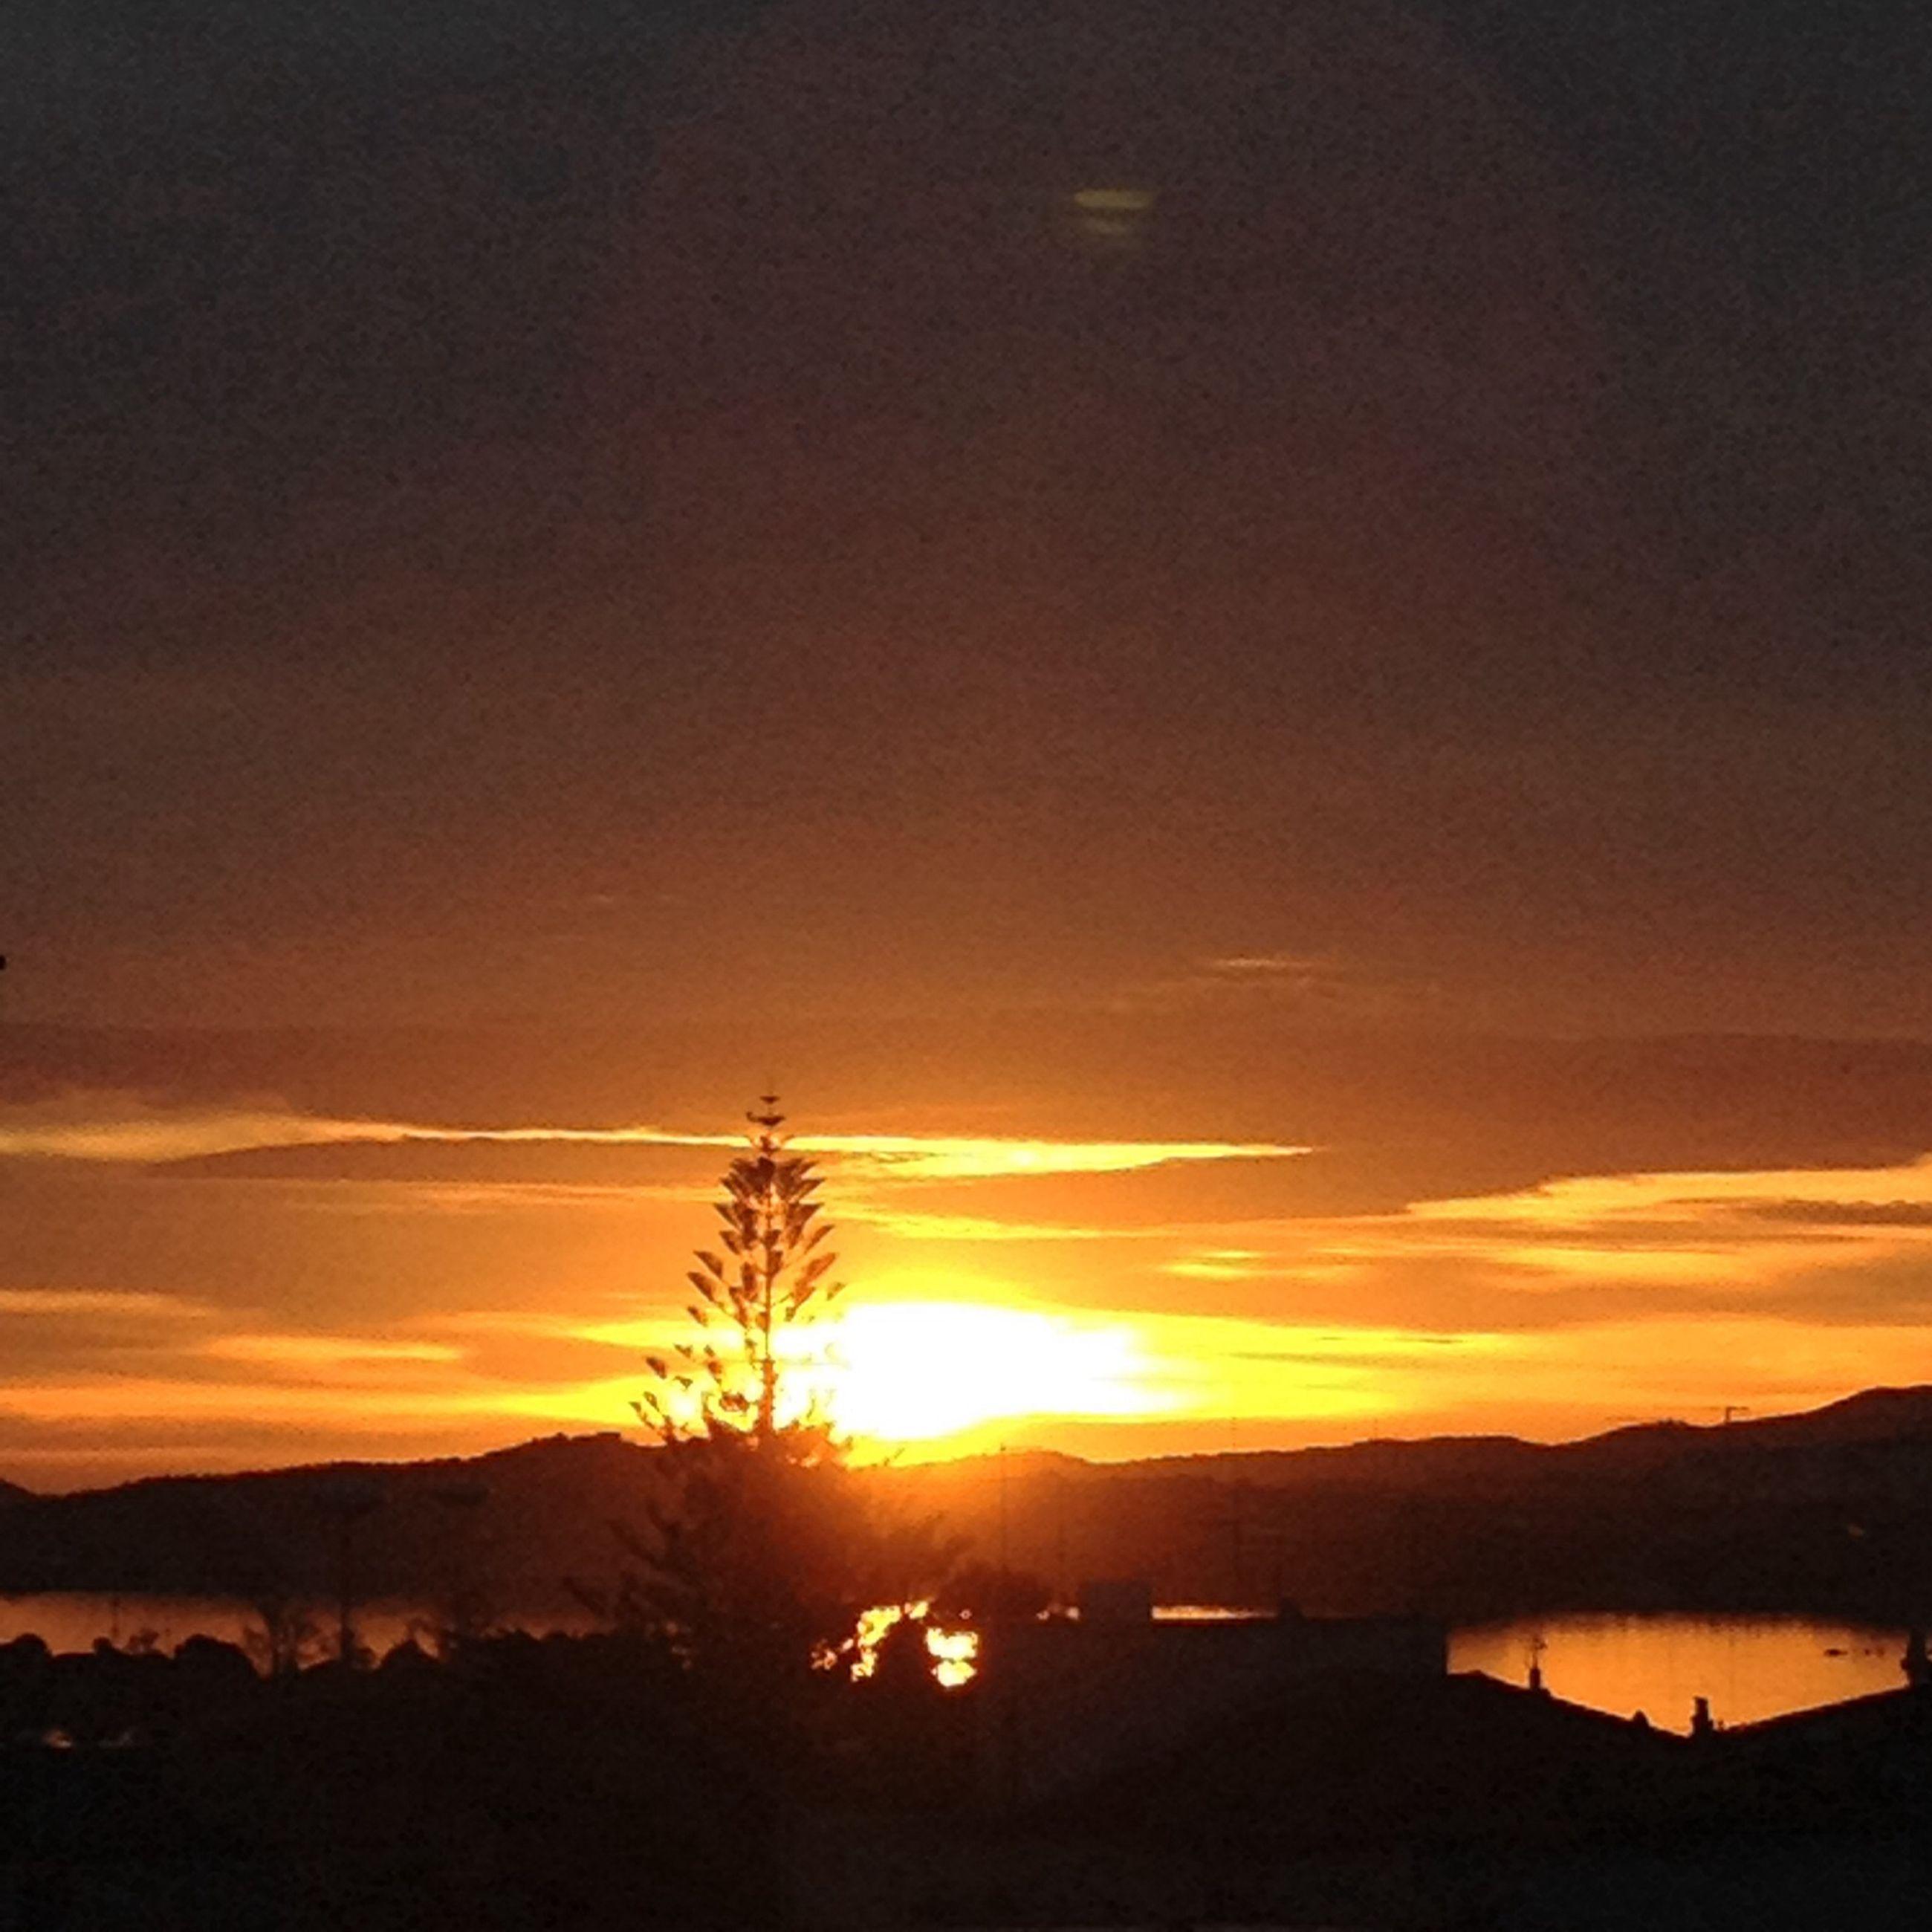 sunset, sun, silhouette, tranquil scene, scenics, tranquility, sky, beauty in nature, sunlight, nature, idyllic, orange color, mountain, cloud - sky, sunbeam, landscape, tree, cloud, lens flare, outdoors